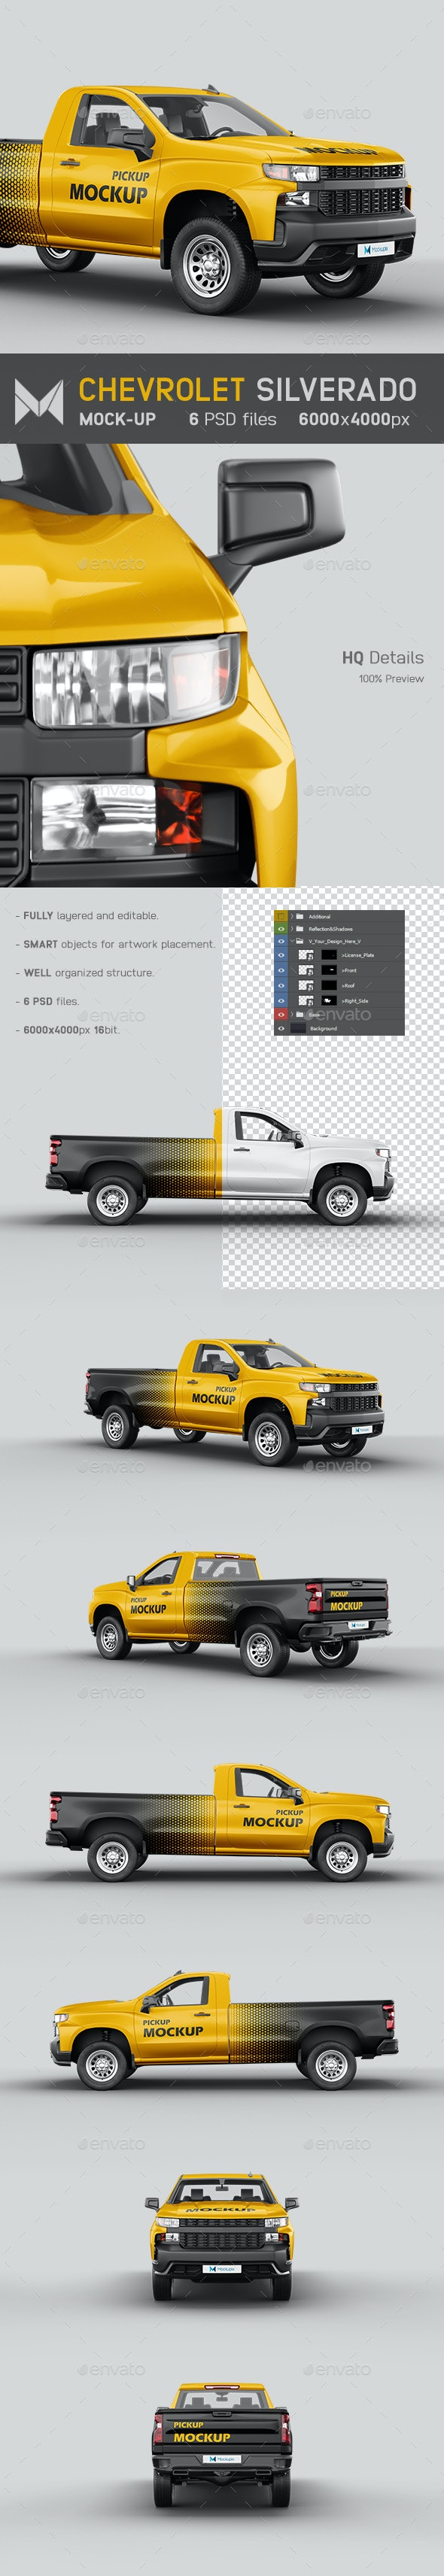 Chevrolet Silverado Pickup Mockup - Vehicle Wraps Print